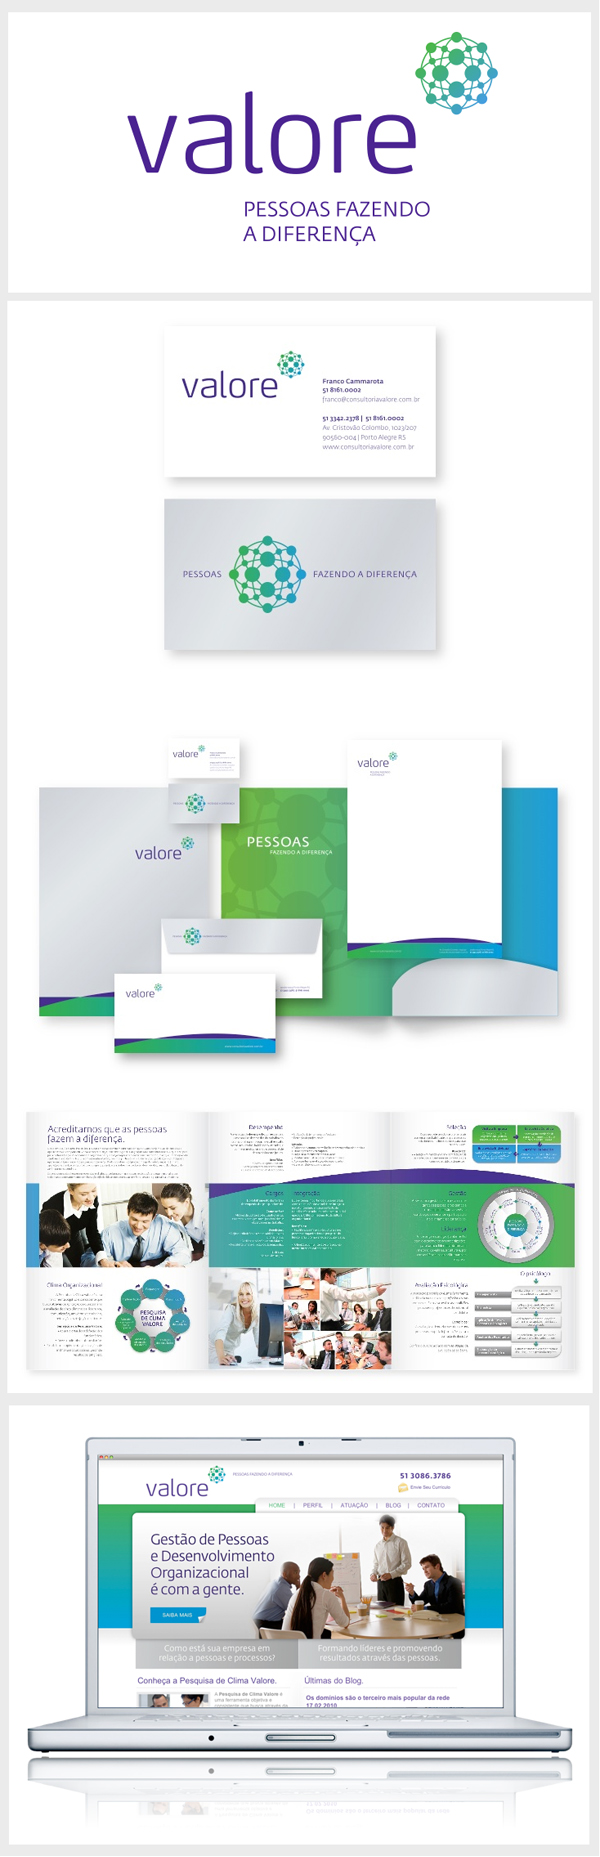 valore - Brand identity by Elementar Design